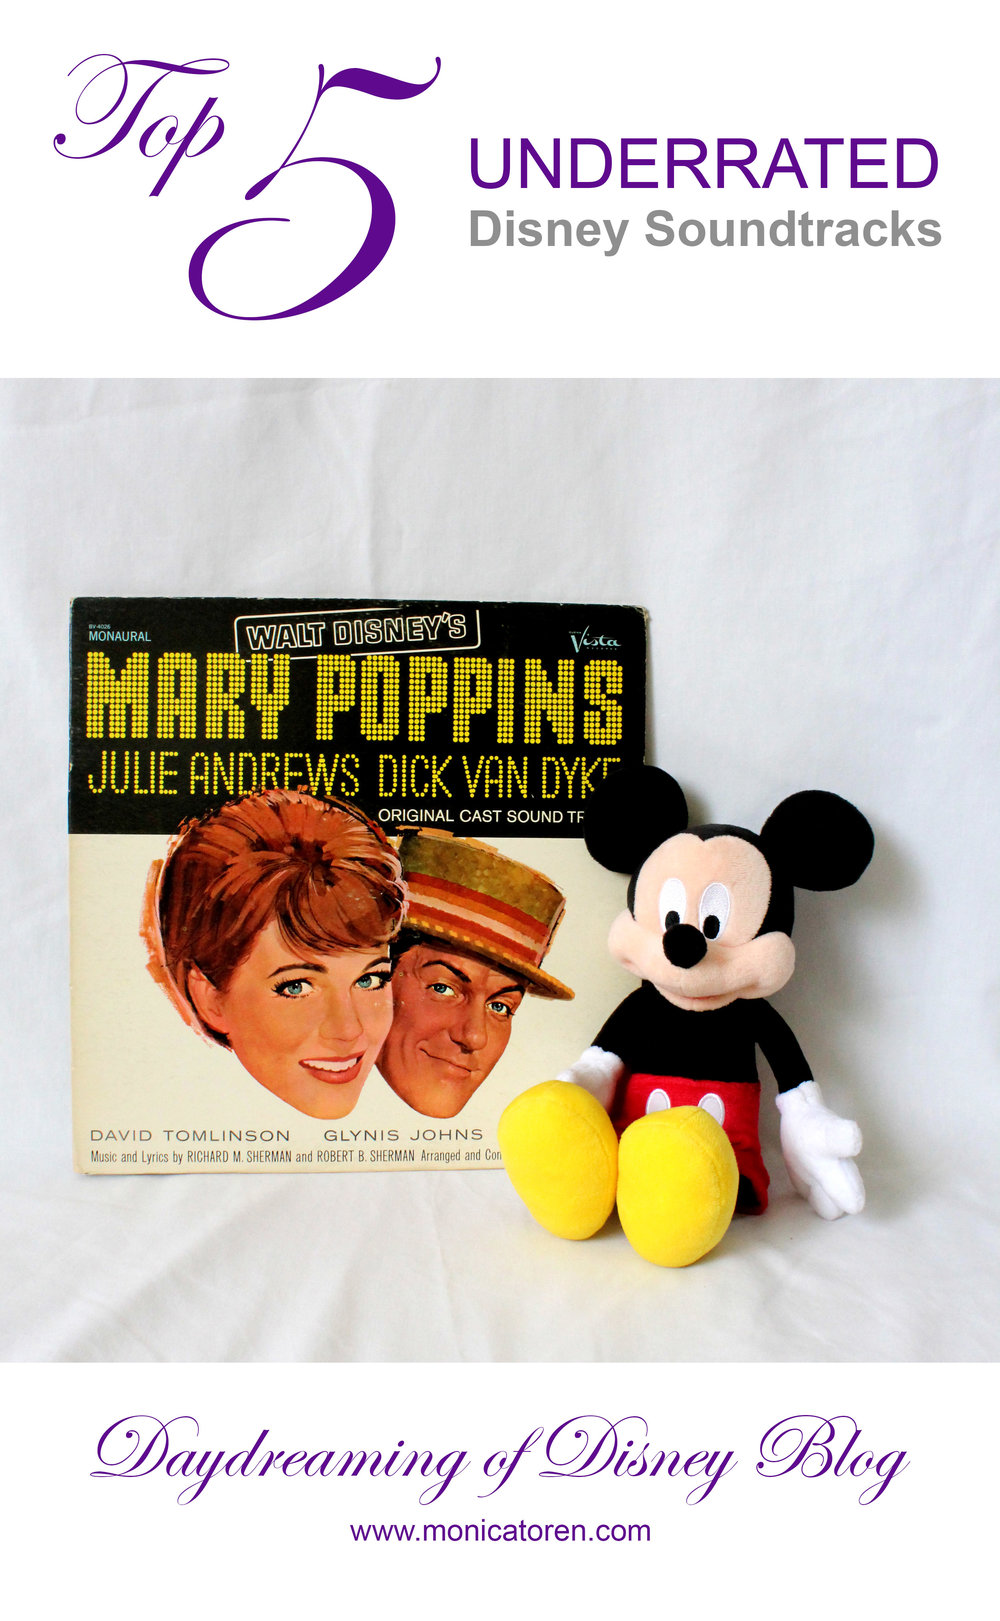 Daydreaming of Disney Blog - Top 5 Underrated Disney Soundtracks - http://www.monicatoren.com